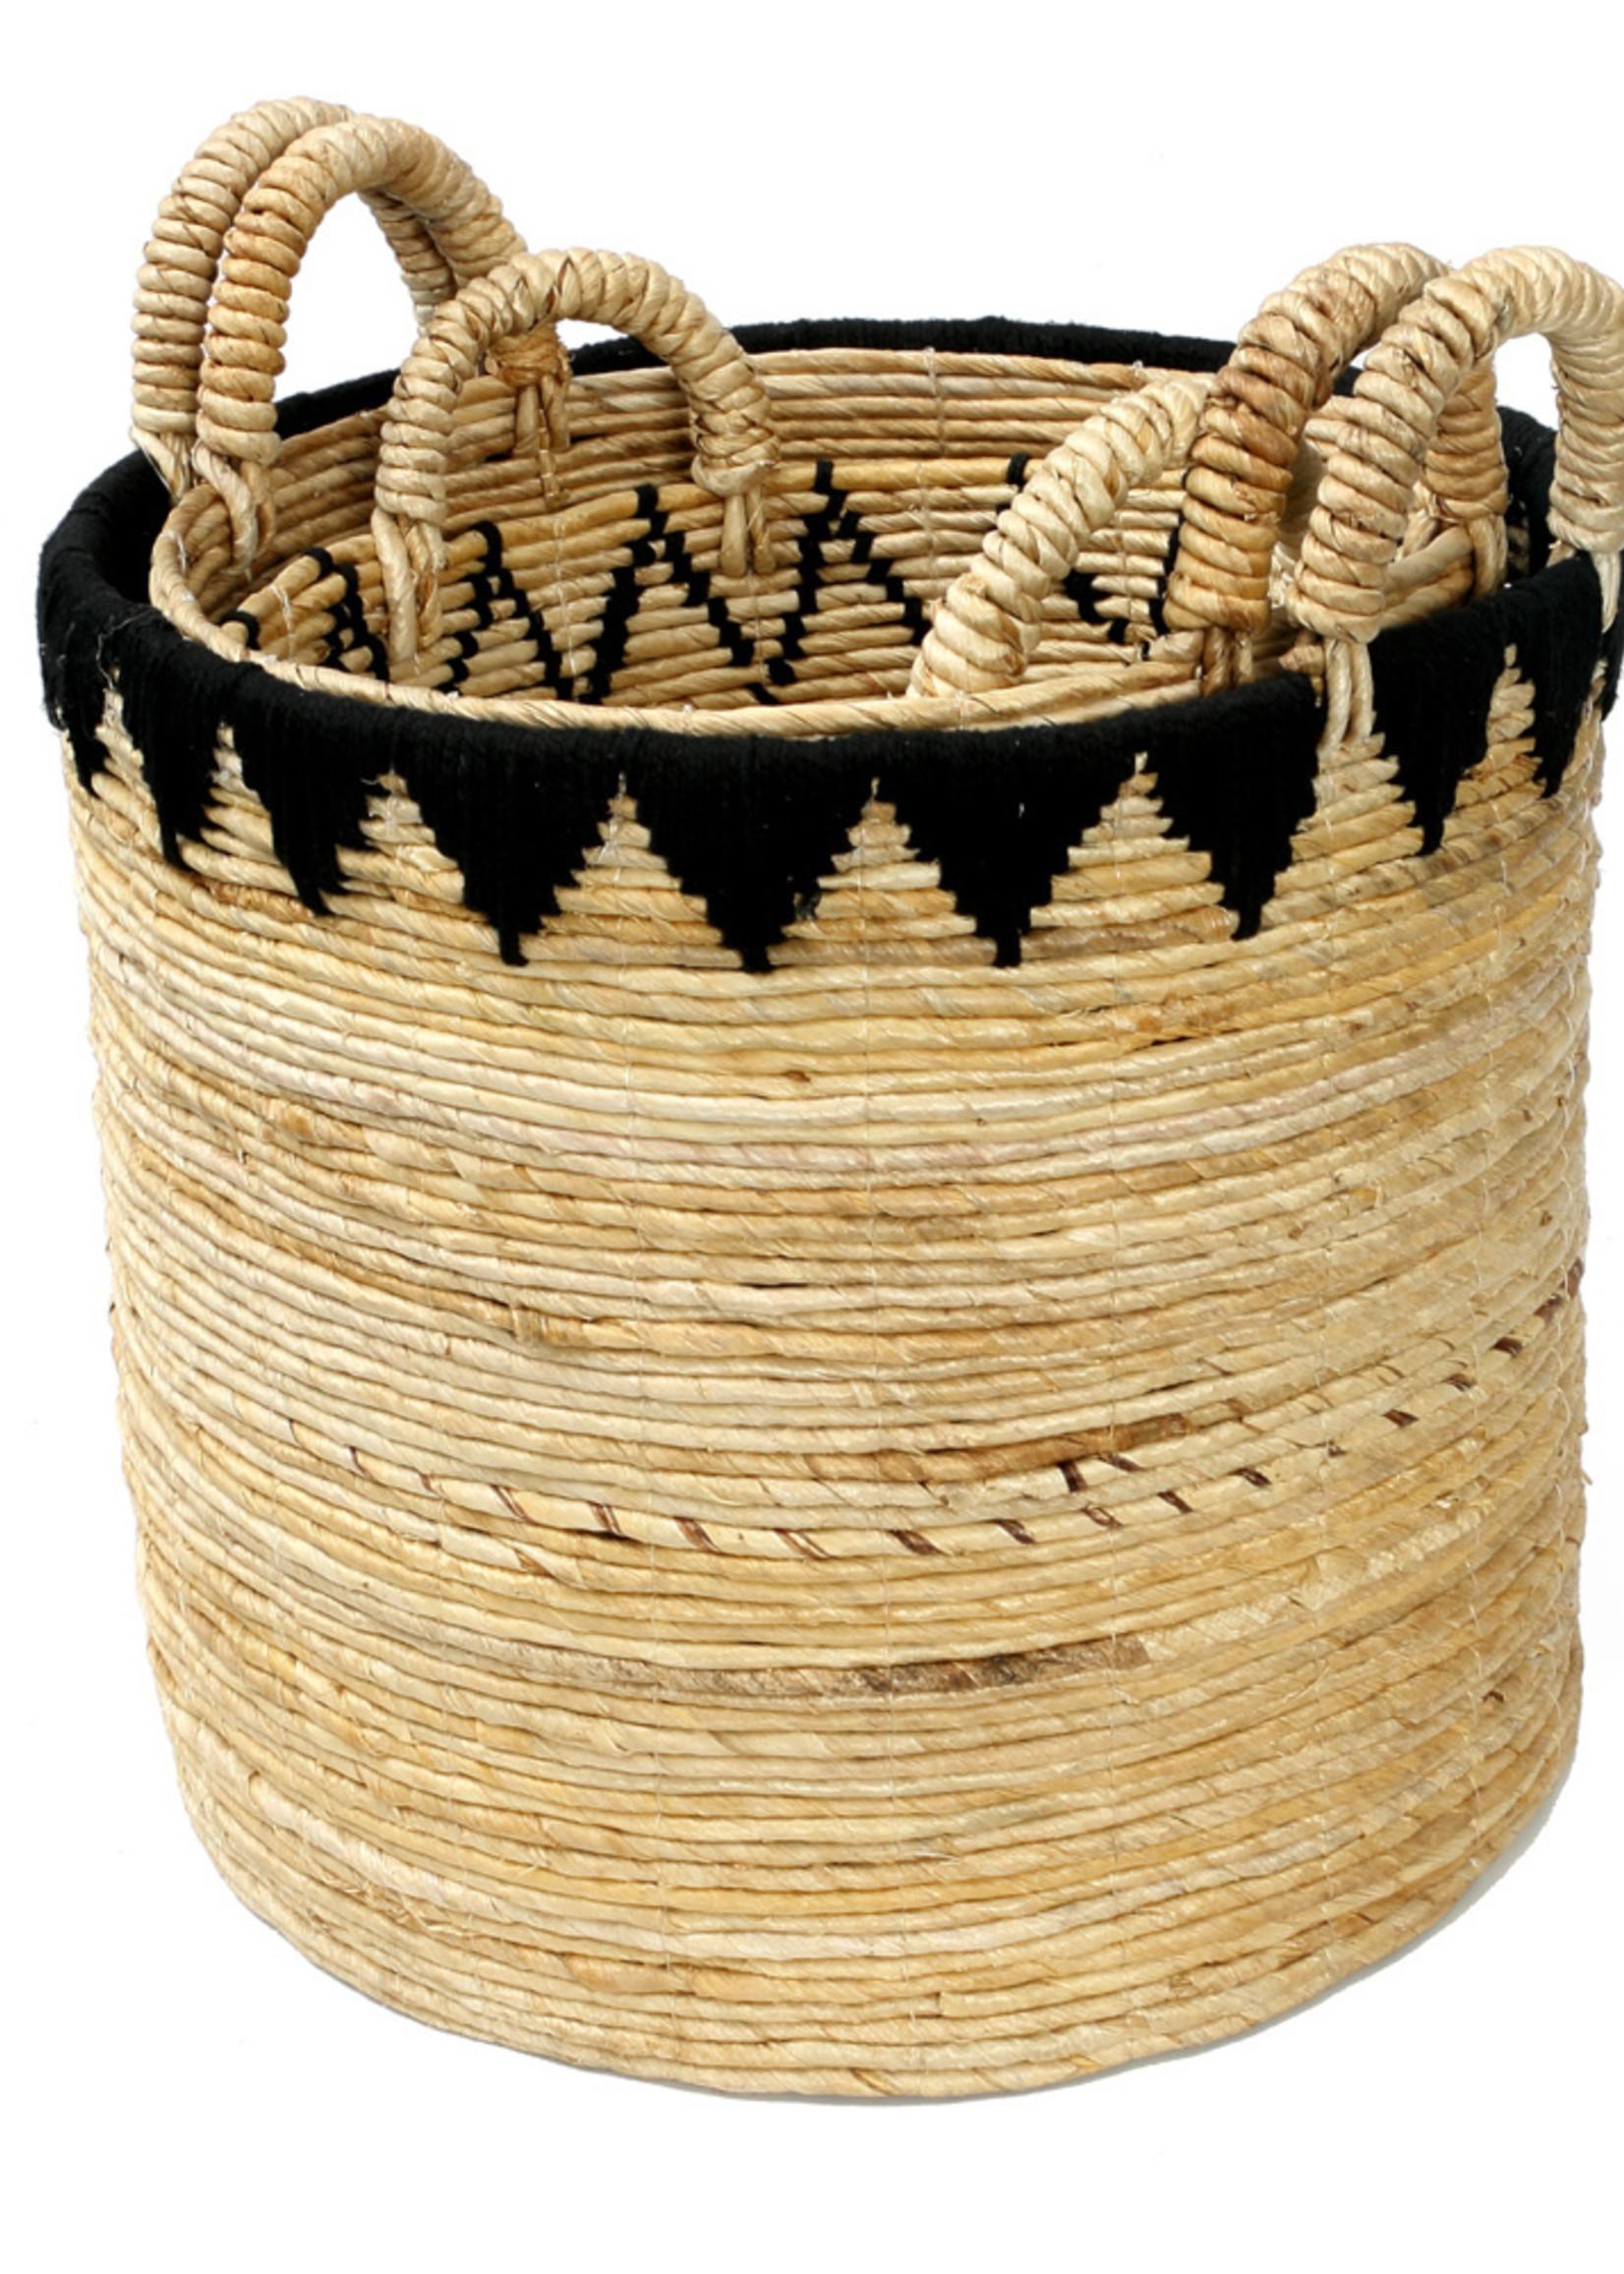 The Banana Stitched Baskets - Natural Black - SET3